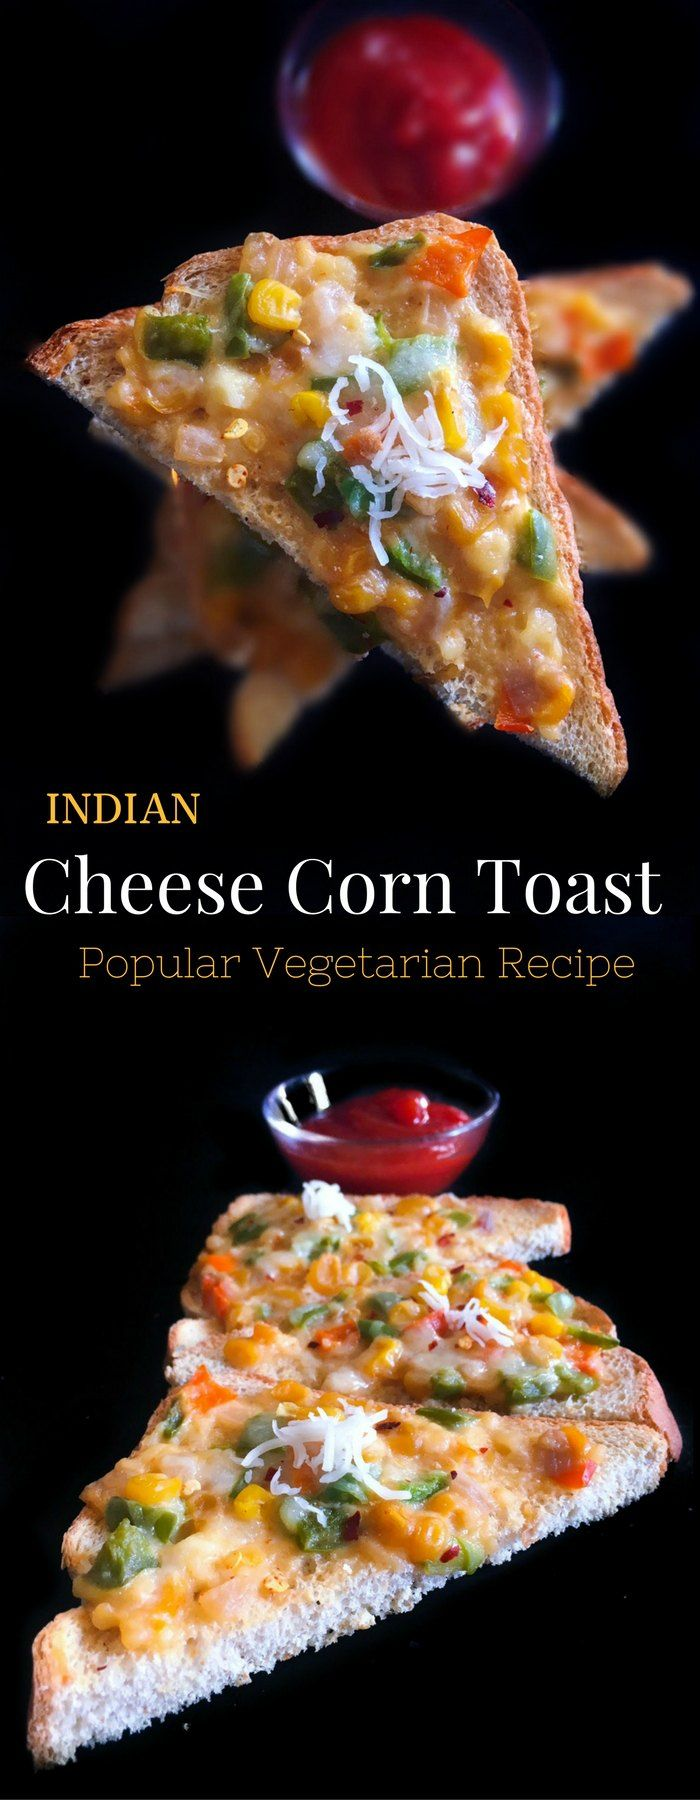 Indian Cheese Corn Toast - Popular Vegetarian Recipe : #sundaysupper #corn…